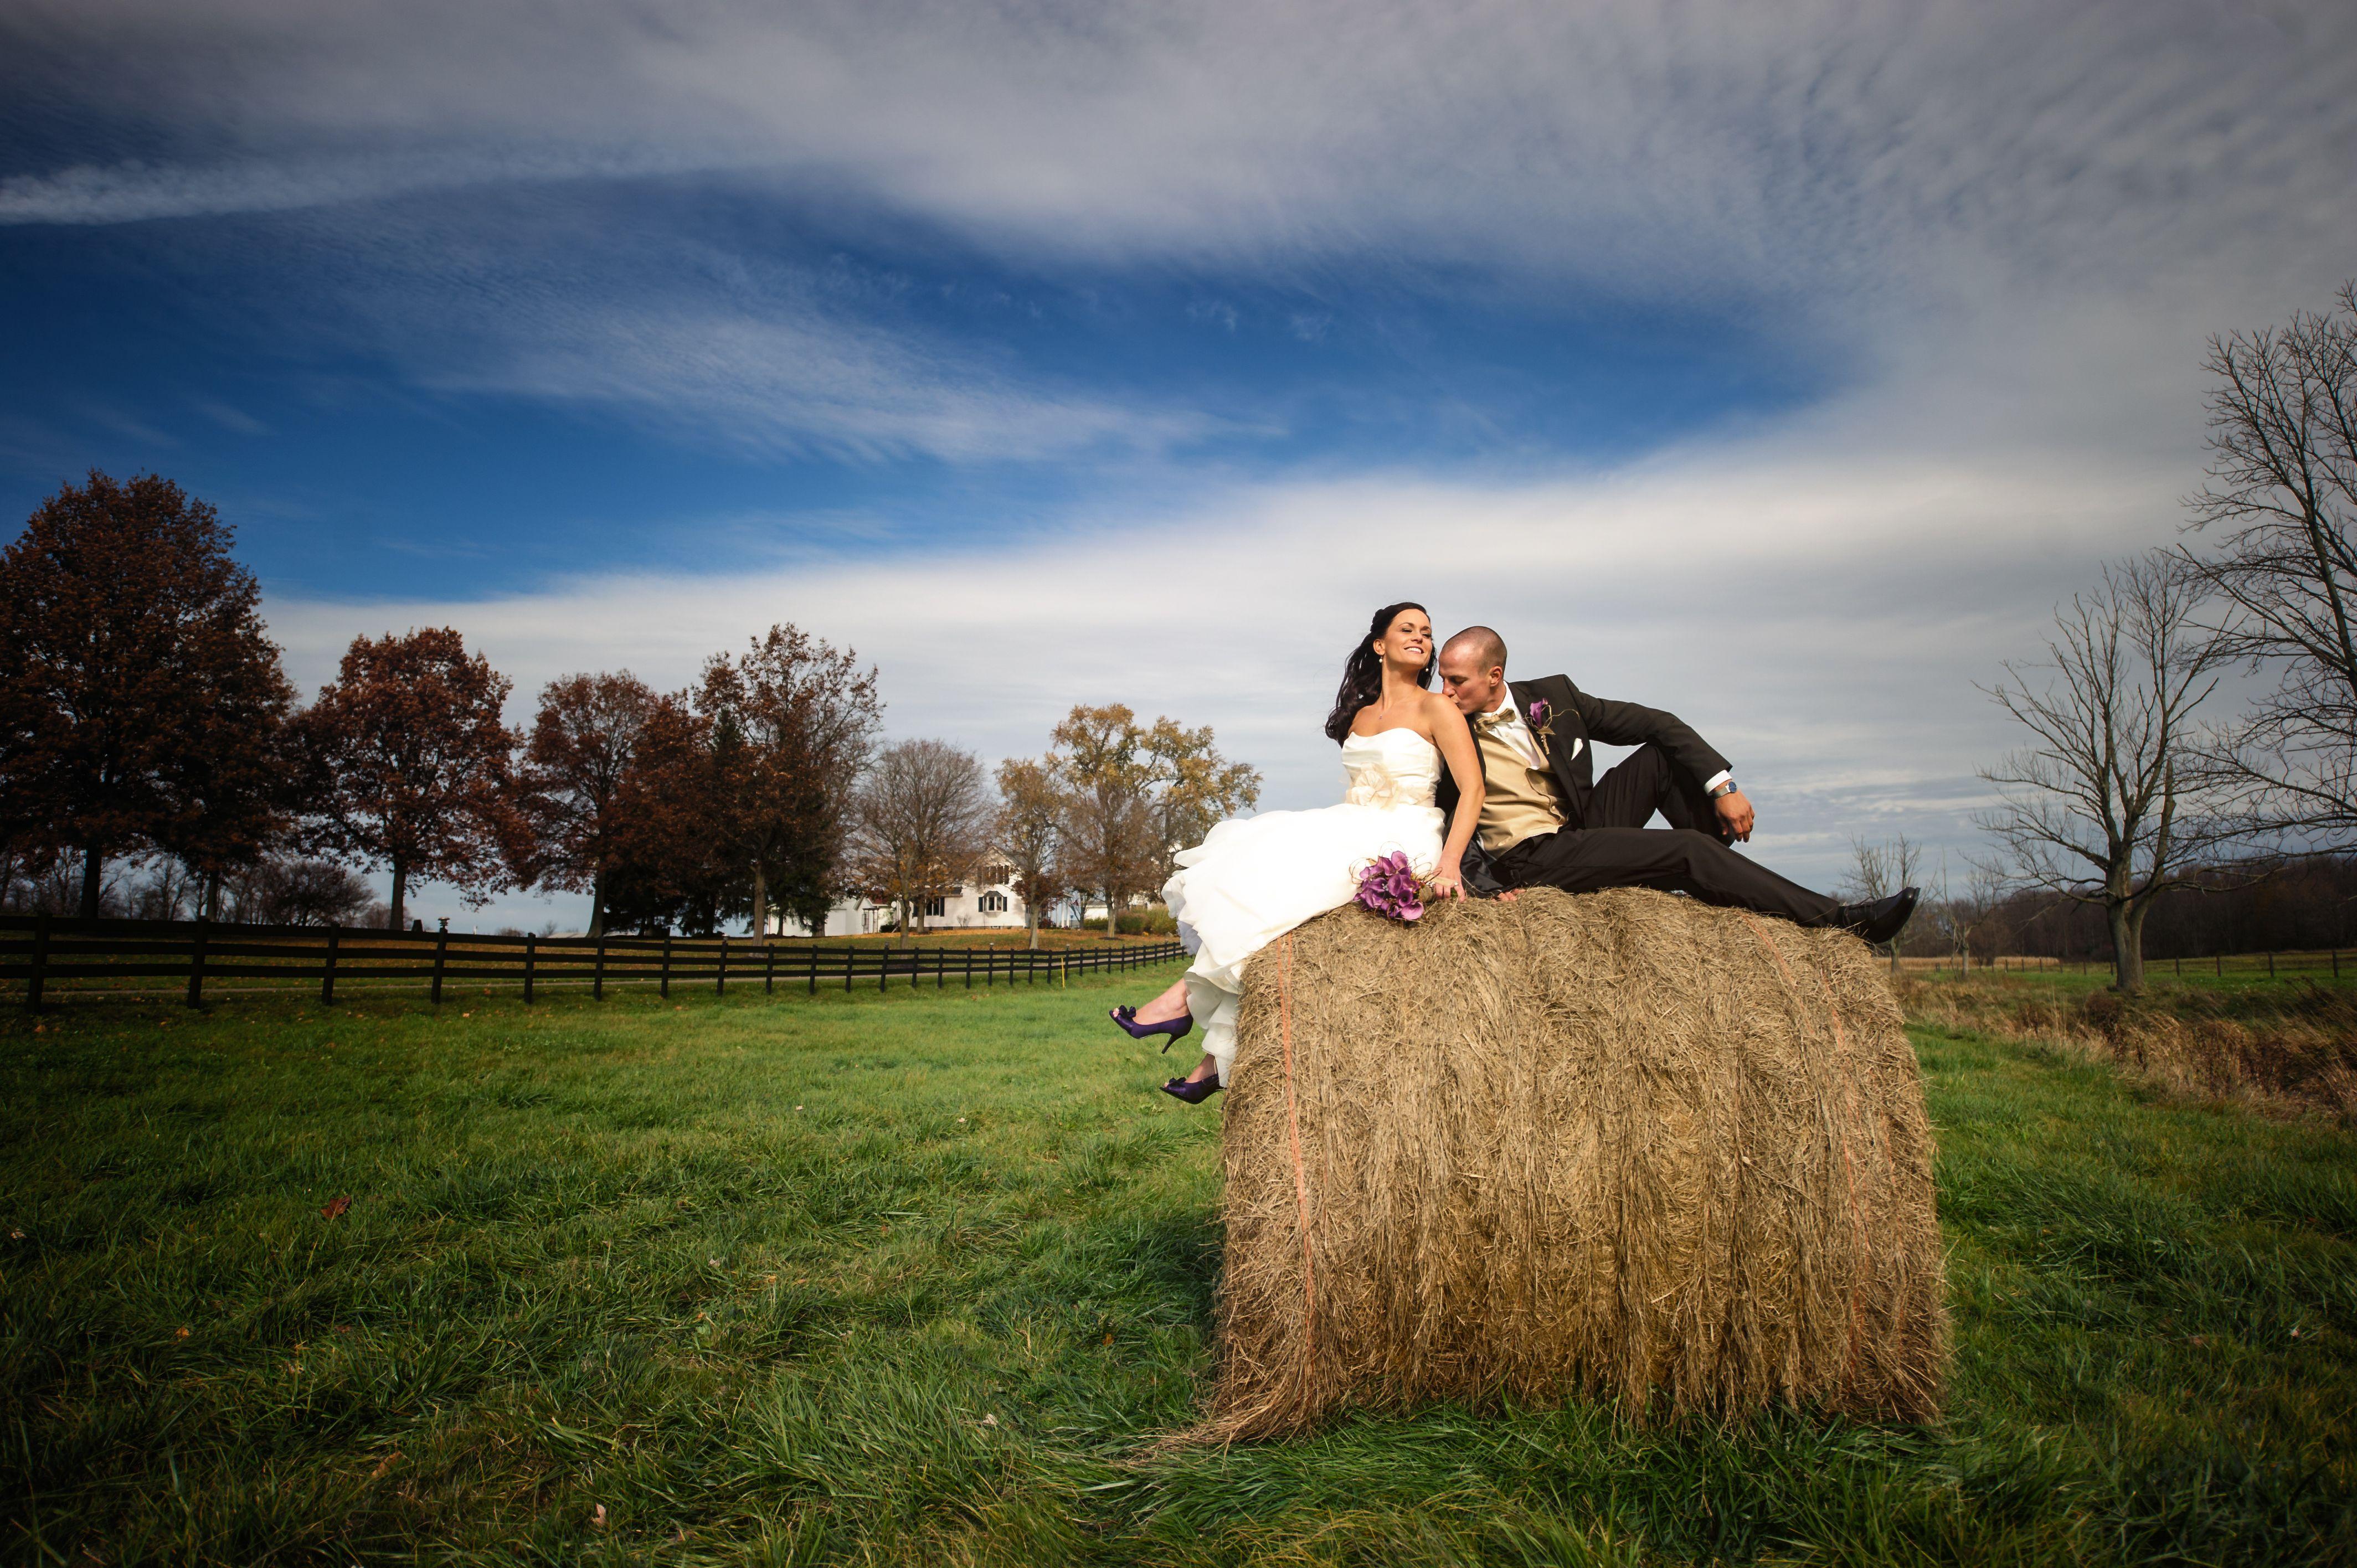 wedding picture locations akron ohio%0A Farm wedding  Brookside Farms  Louisville Ohio Wedding  bride and groom  portraits  Barn